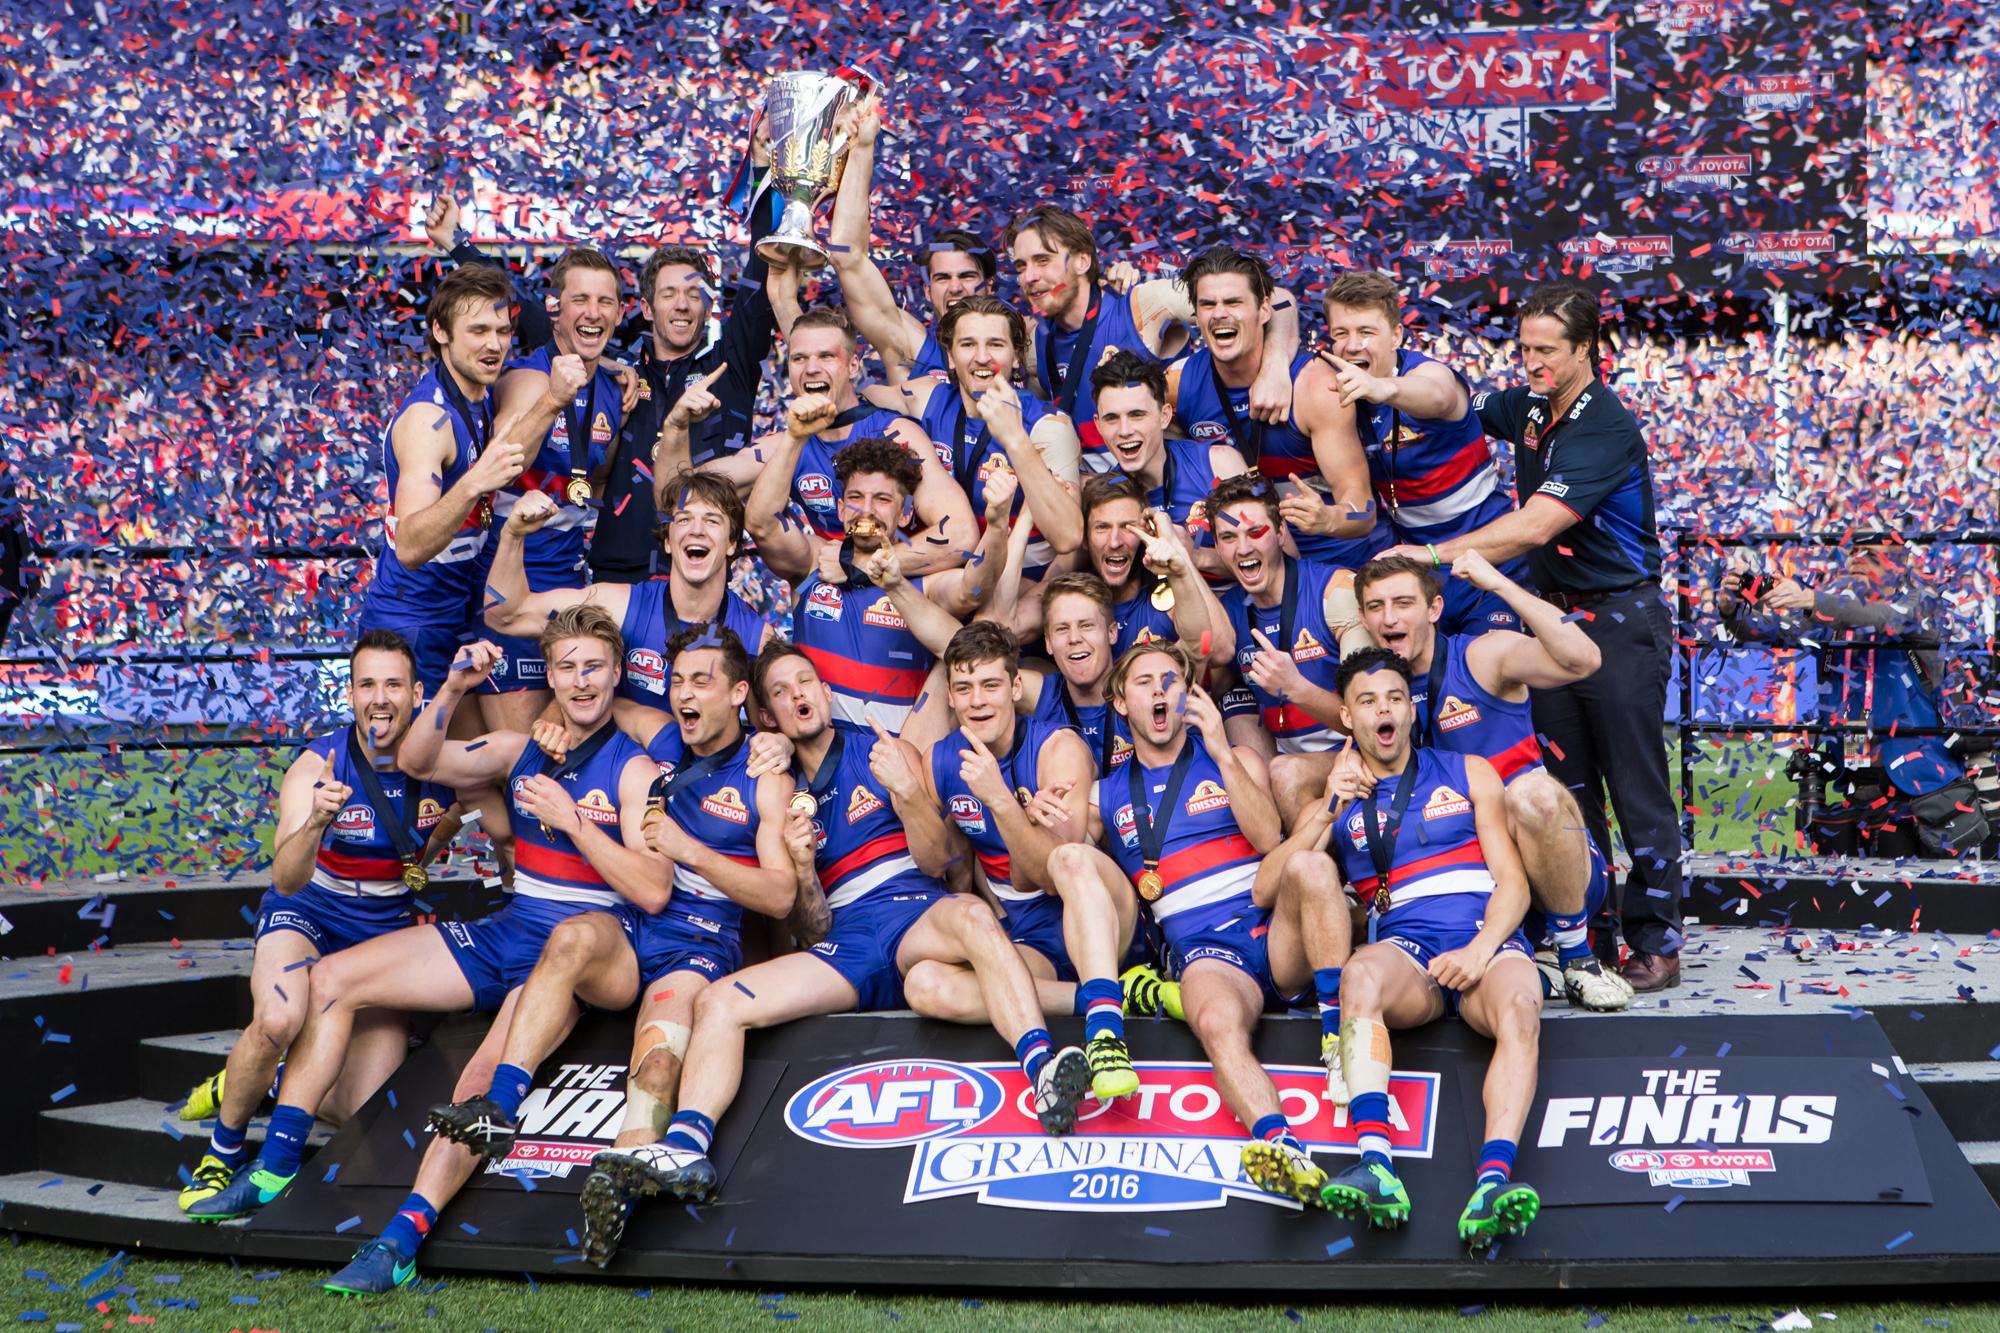 2016 AFL Grand Final